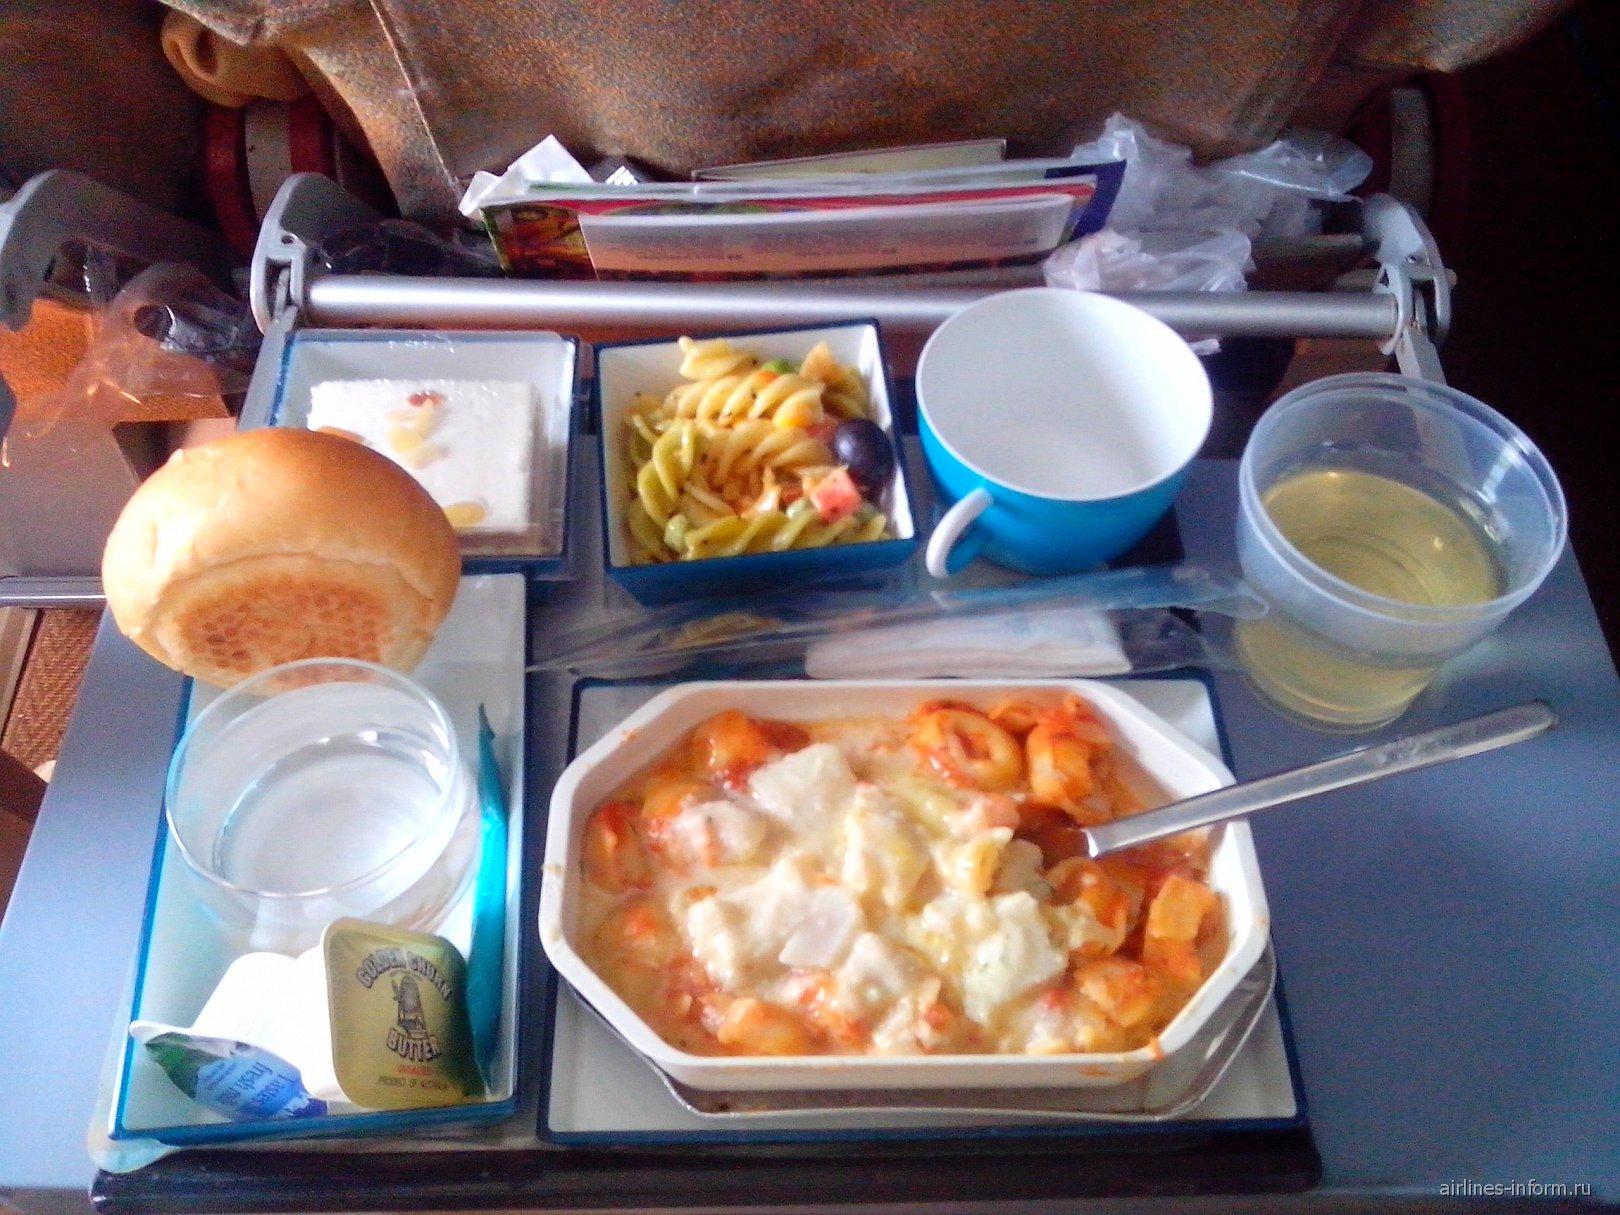 Ланкийская еда на рейсе Коломбо-Москва авиакомпании SriLankan Airlines